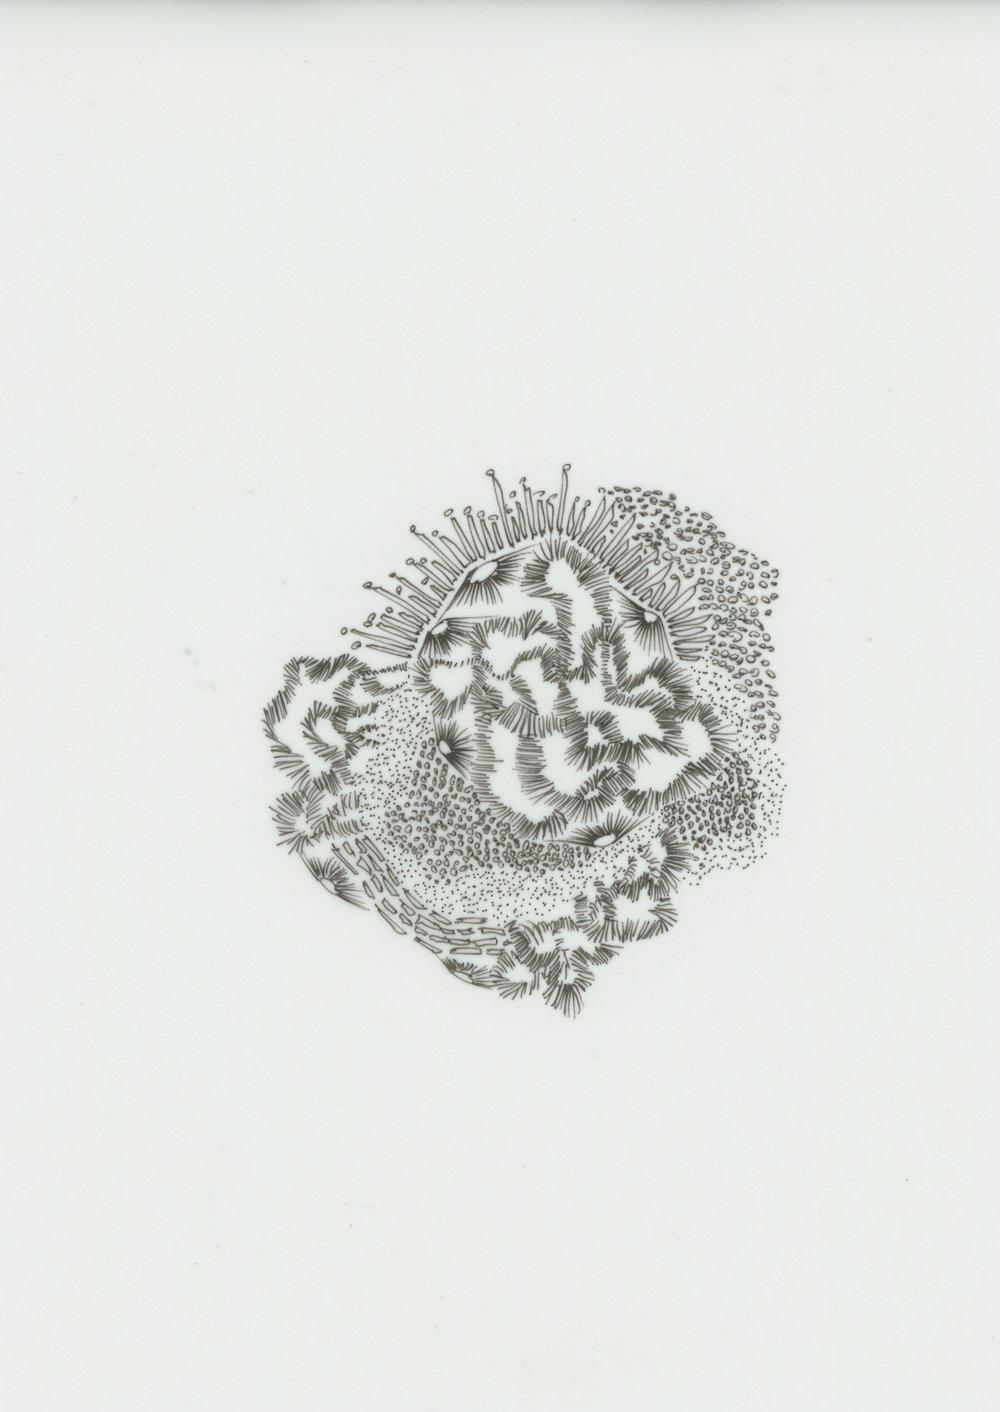 120618.249.SIGGRAPH Asia.jpg